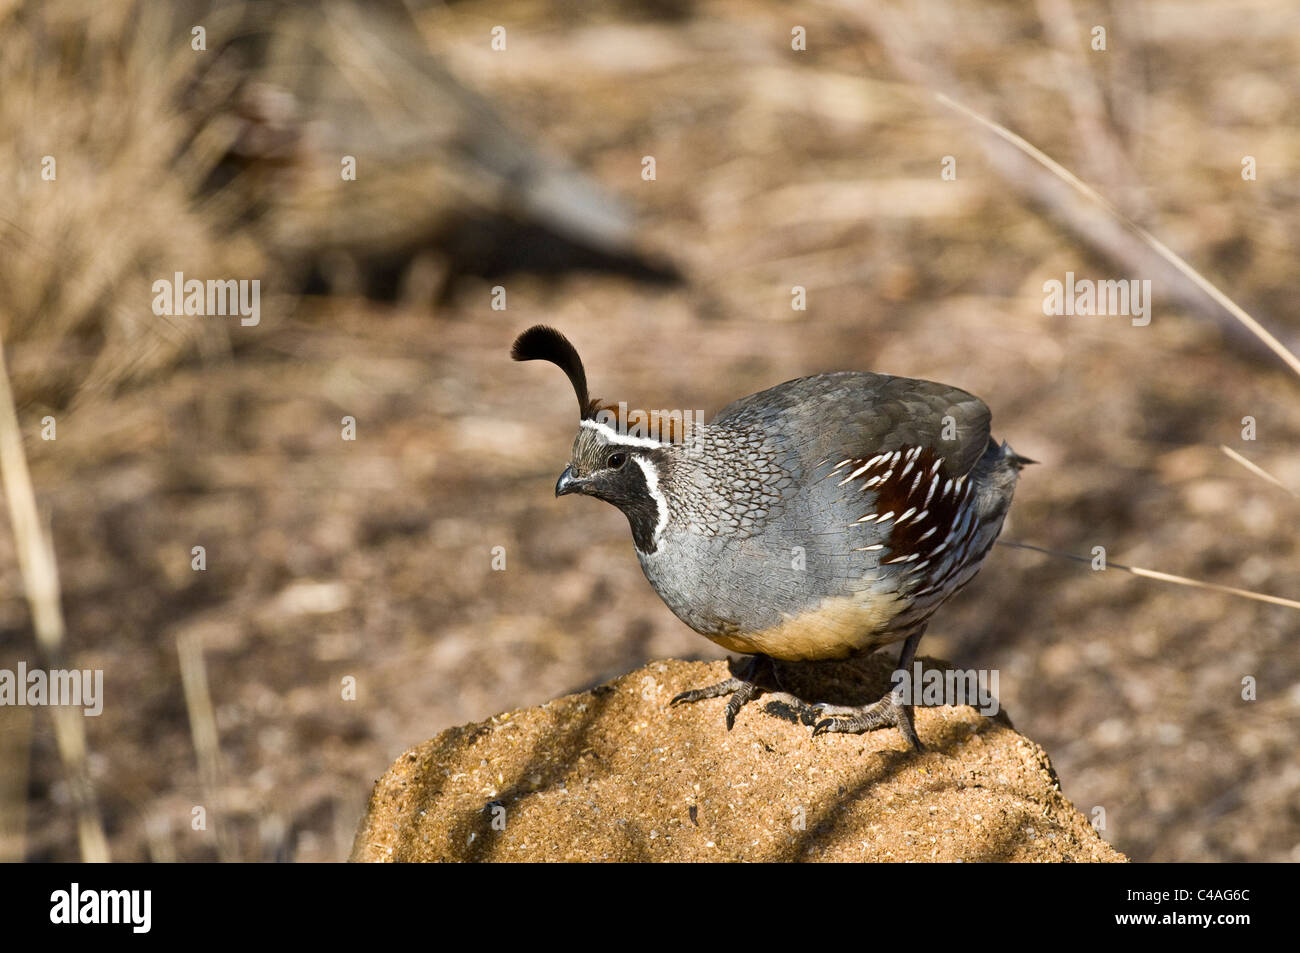 Male Gambel's quail (Callipepla gambelii) - Stock Image